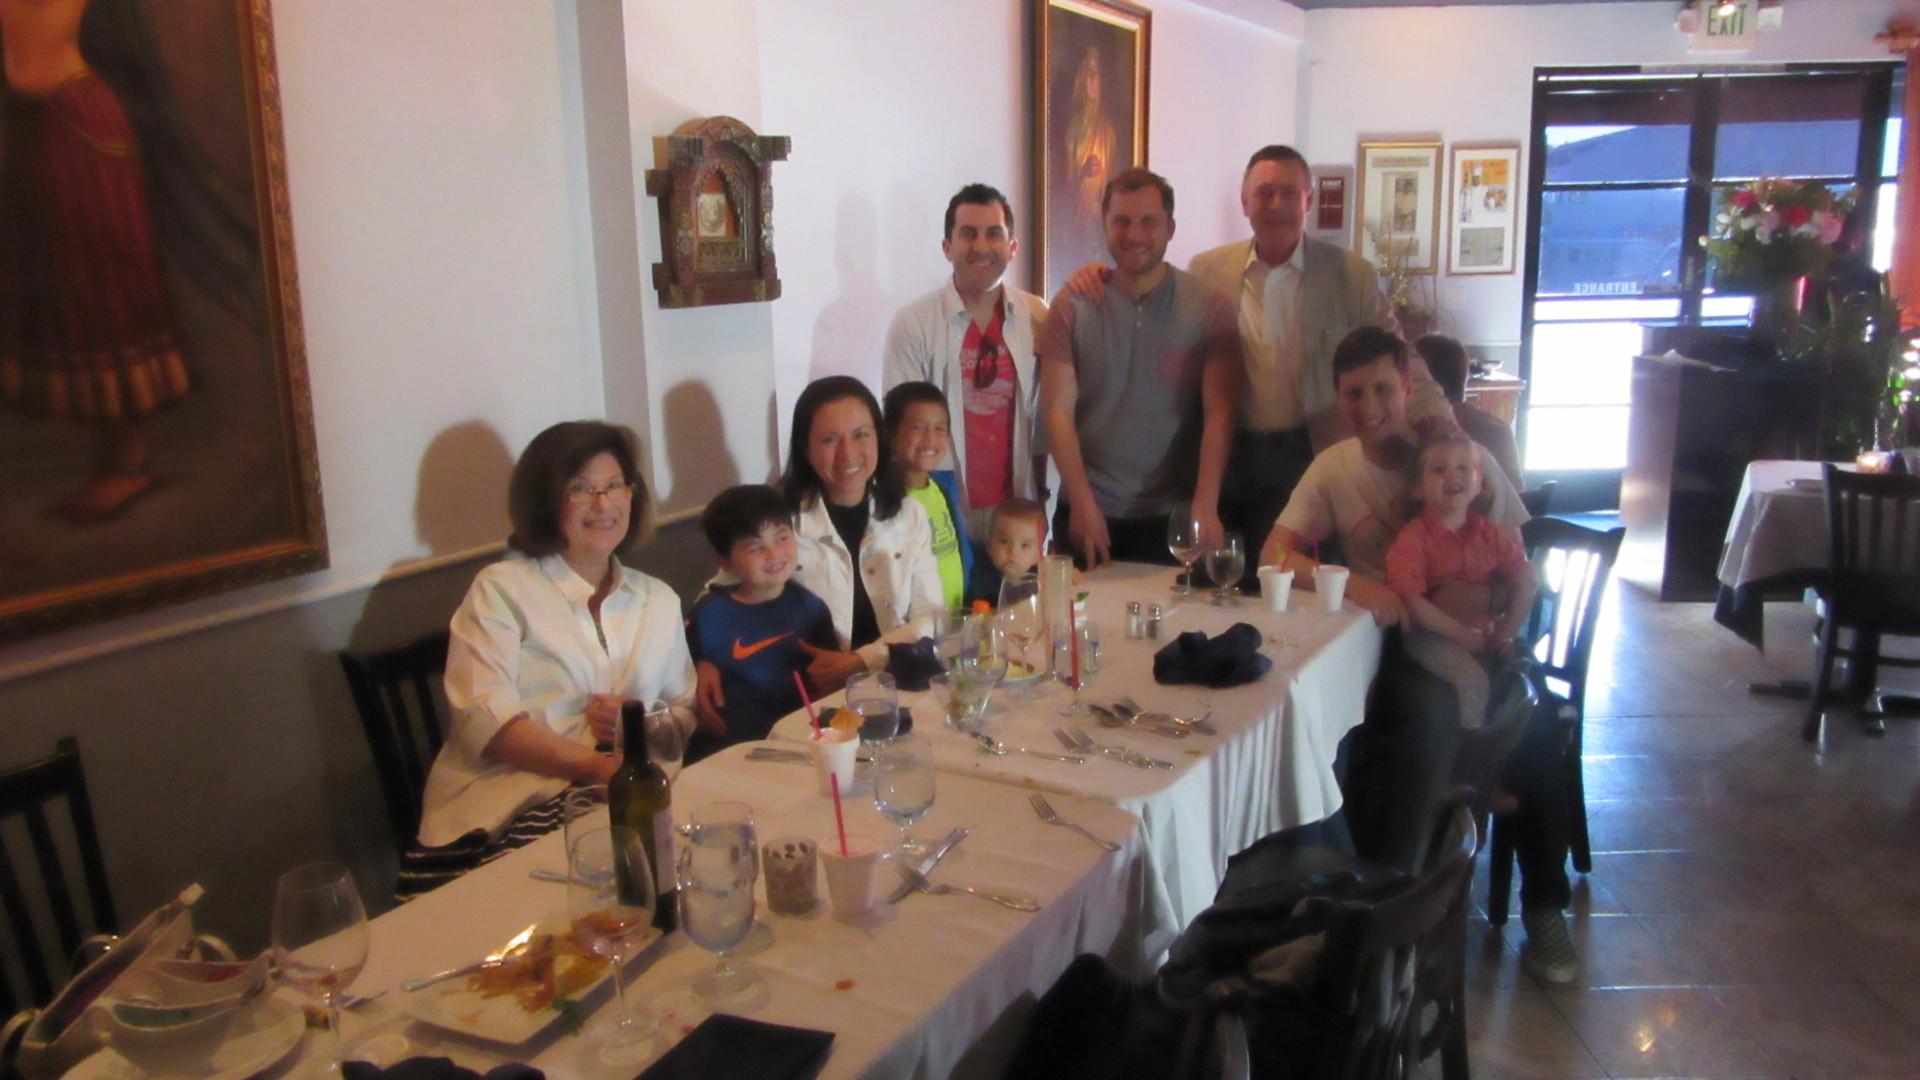 family photo IMG_2038.jpg